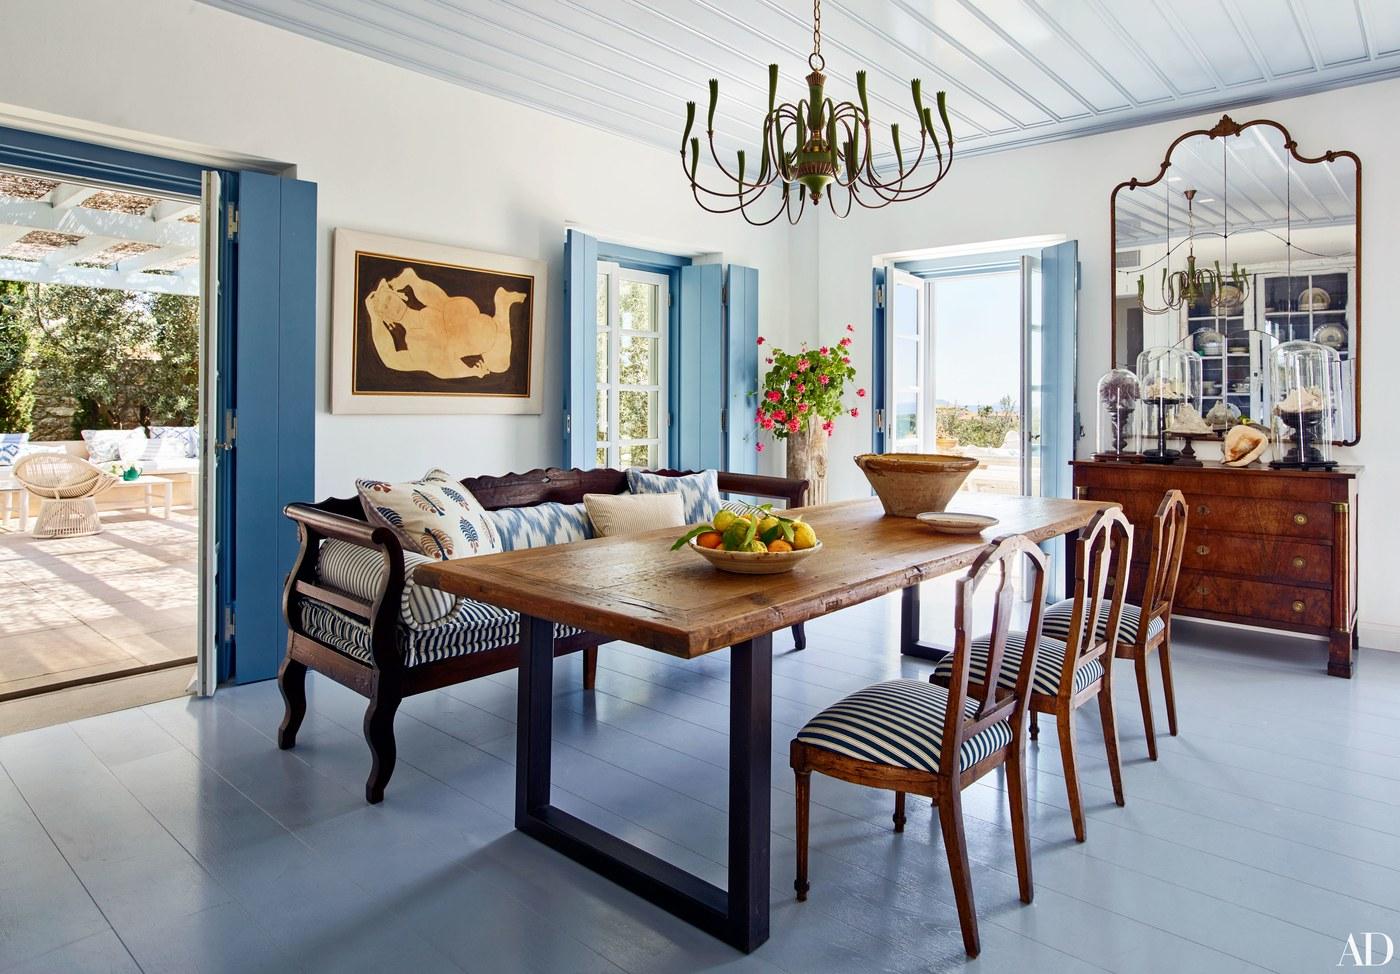 4-visita-guiada-casa-de-ferias-grega-investe-no-azul-claro-praiano